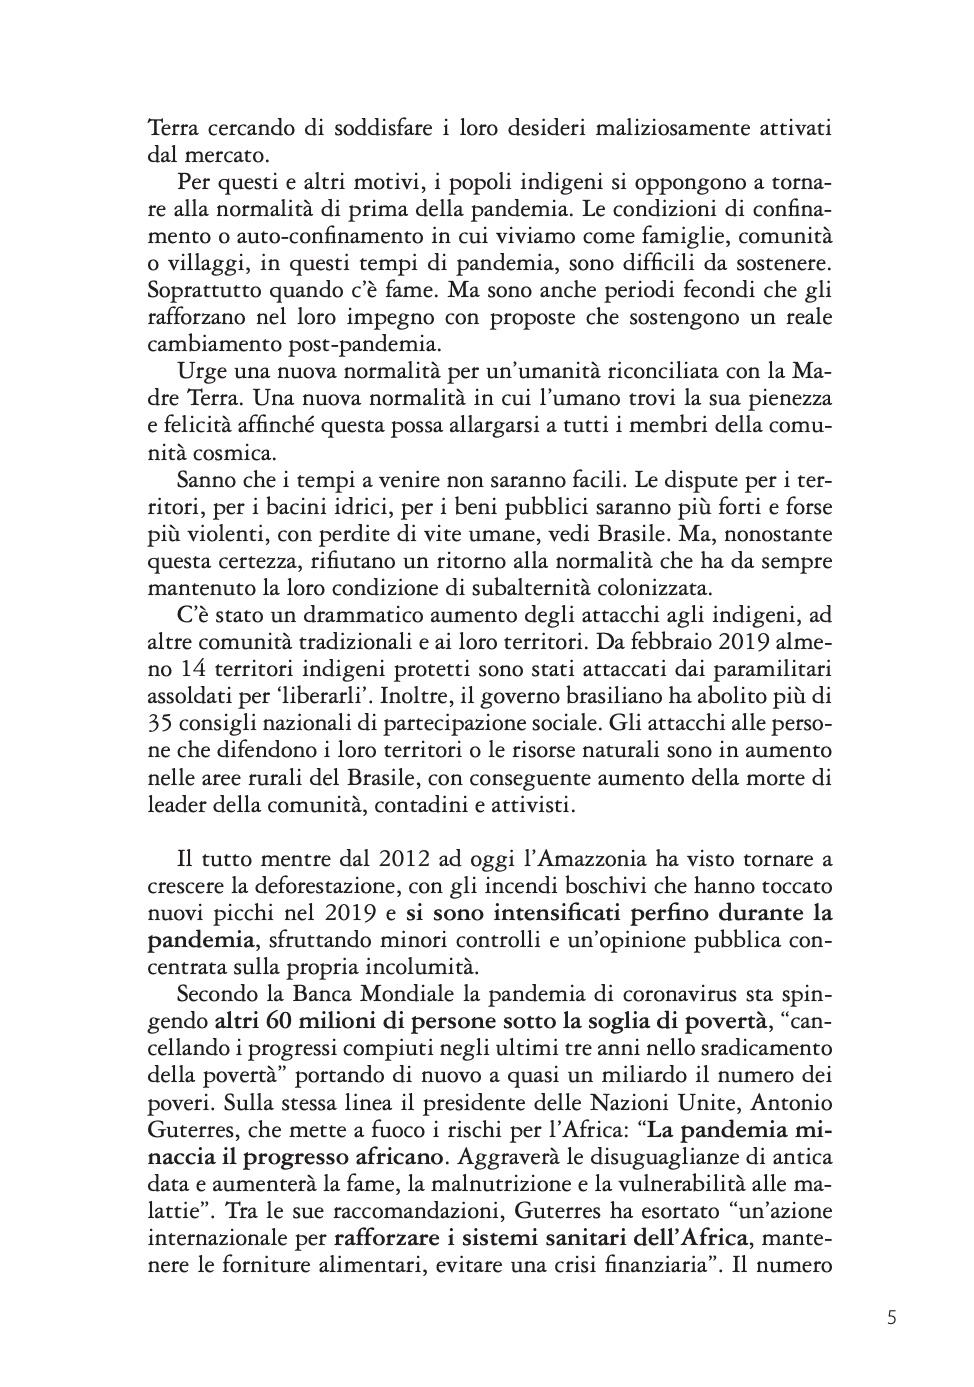 editoriale2.jpg